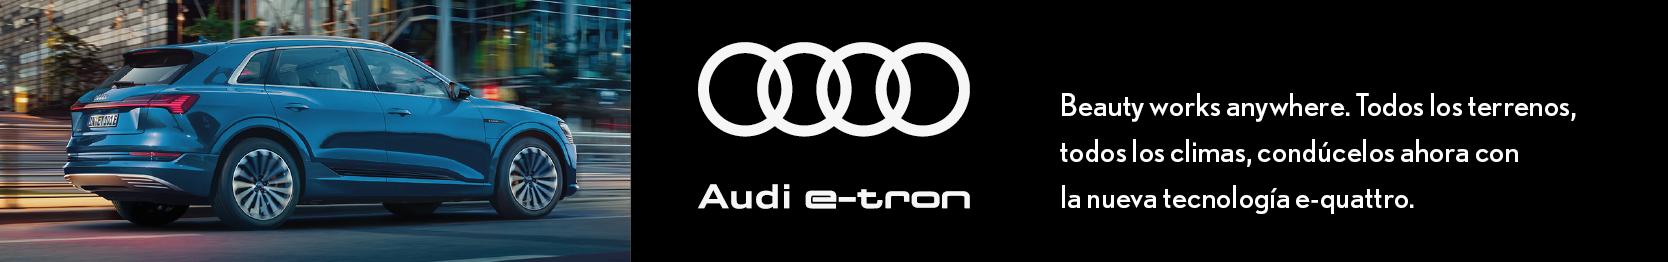 Audi e Tron